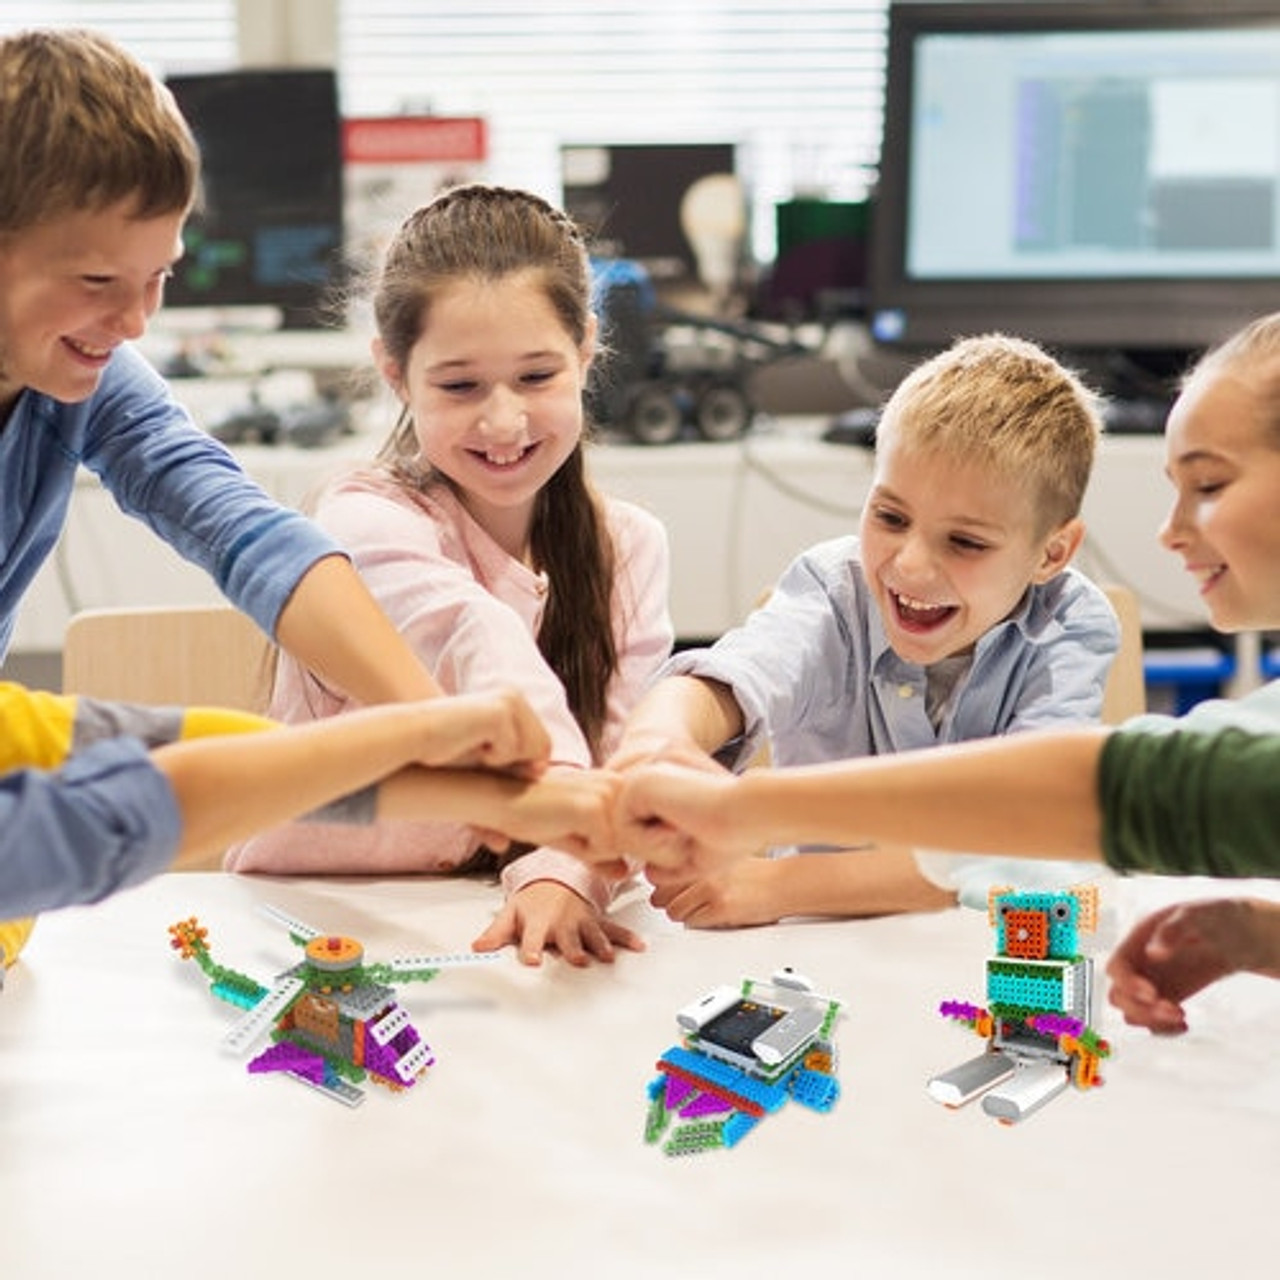 HamiltonBuhl STEAM Education Boost-R-Bots Robot Kit